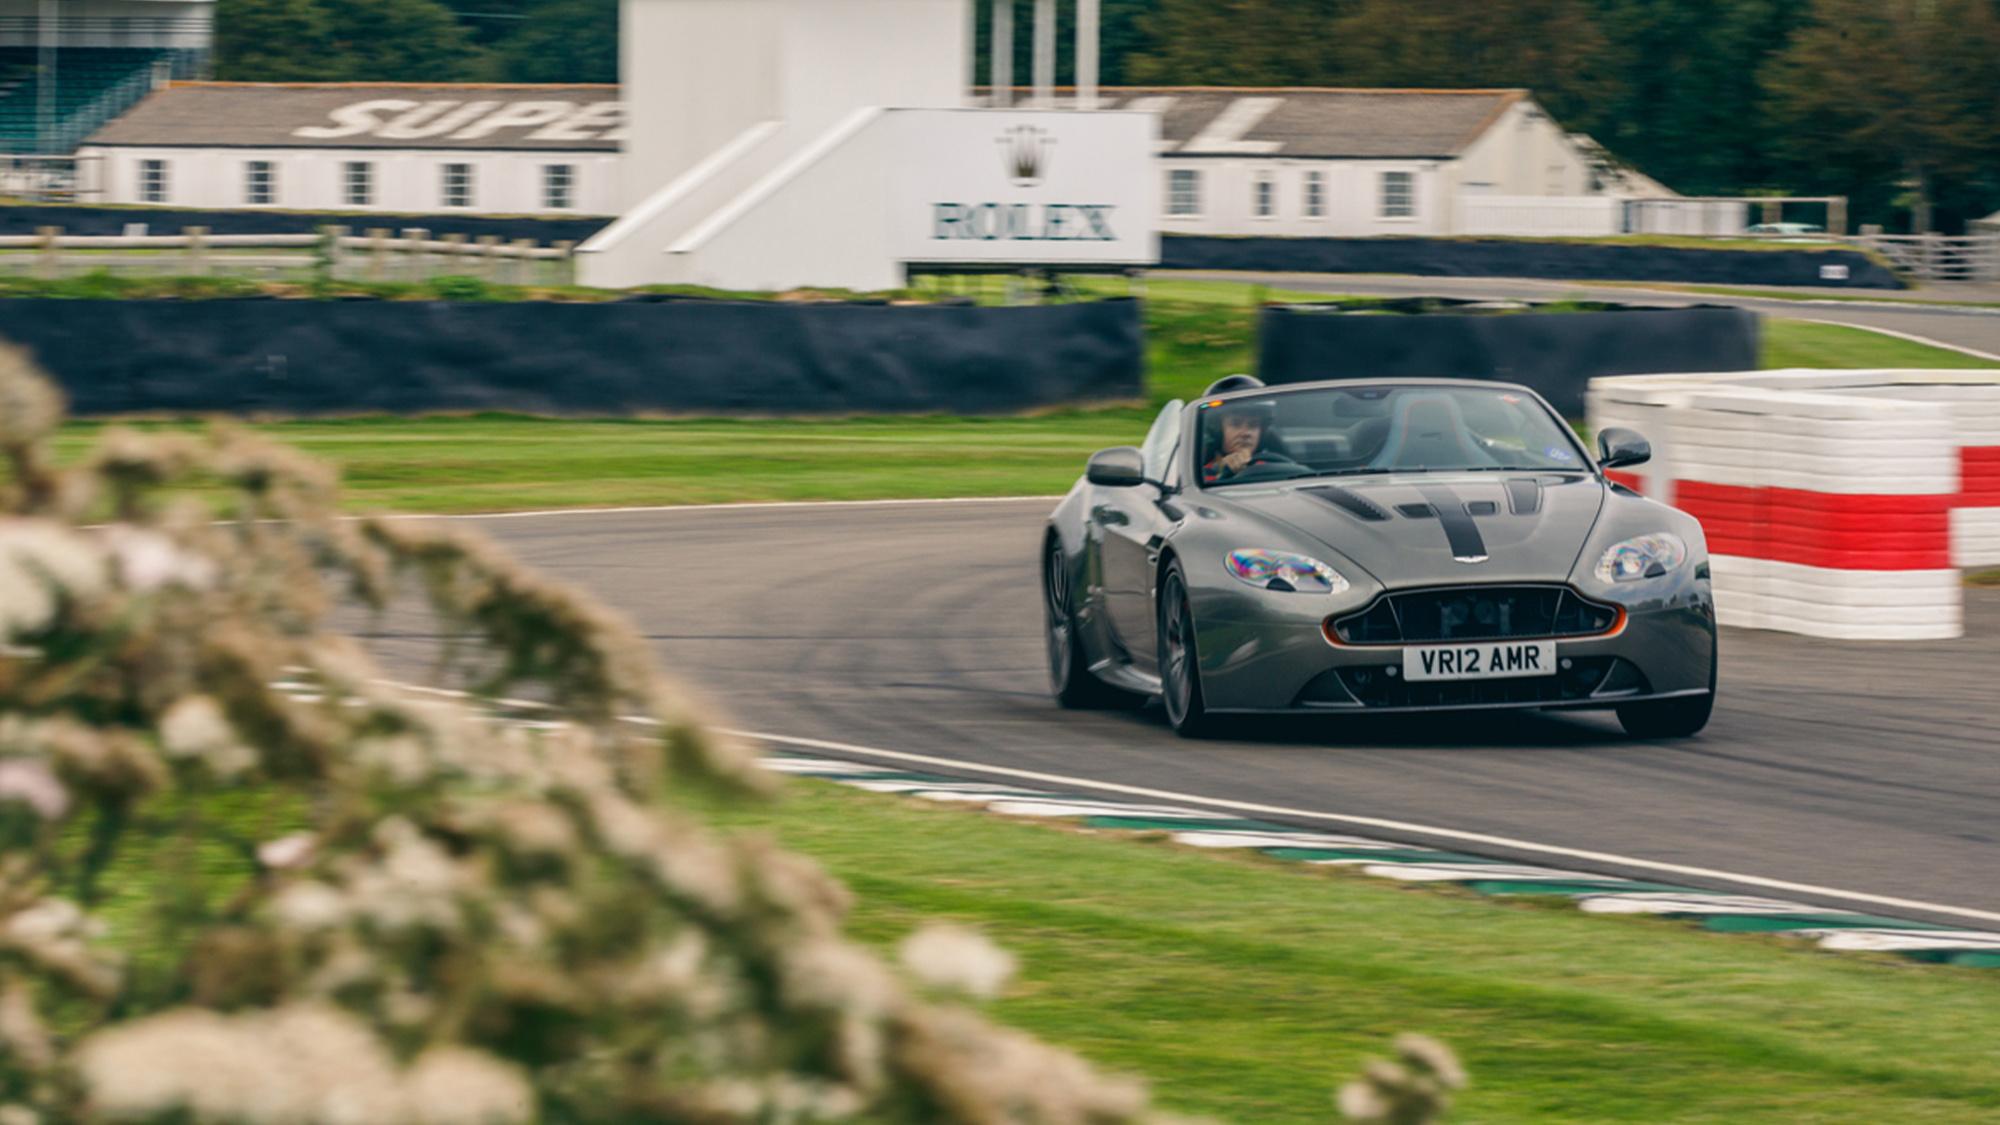 Aston Martin Motor Sport track day at Goodwood